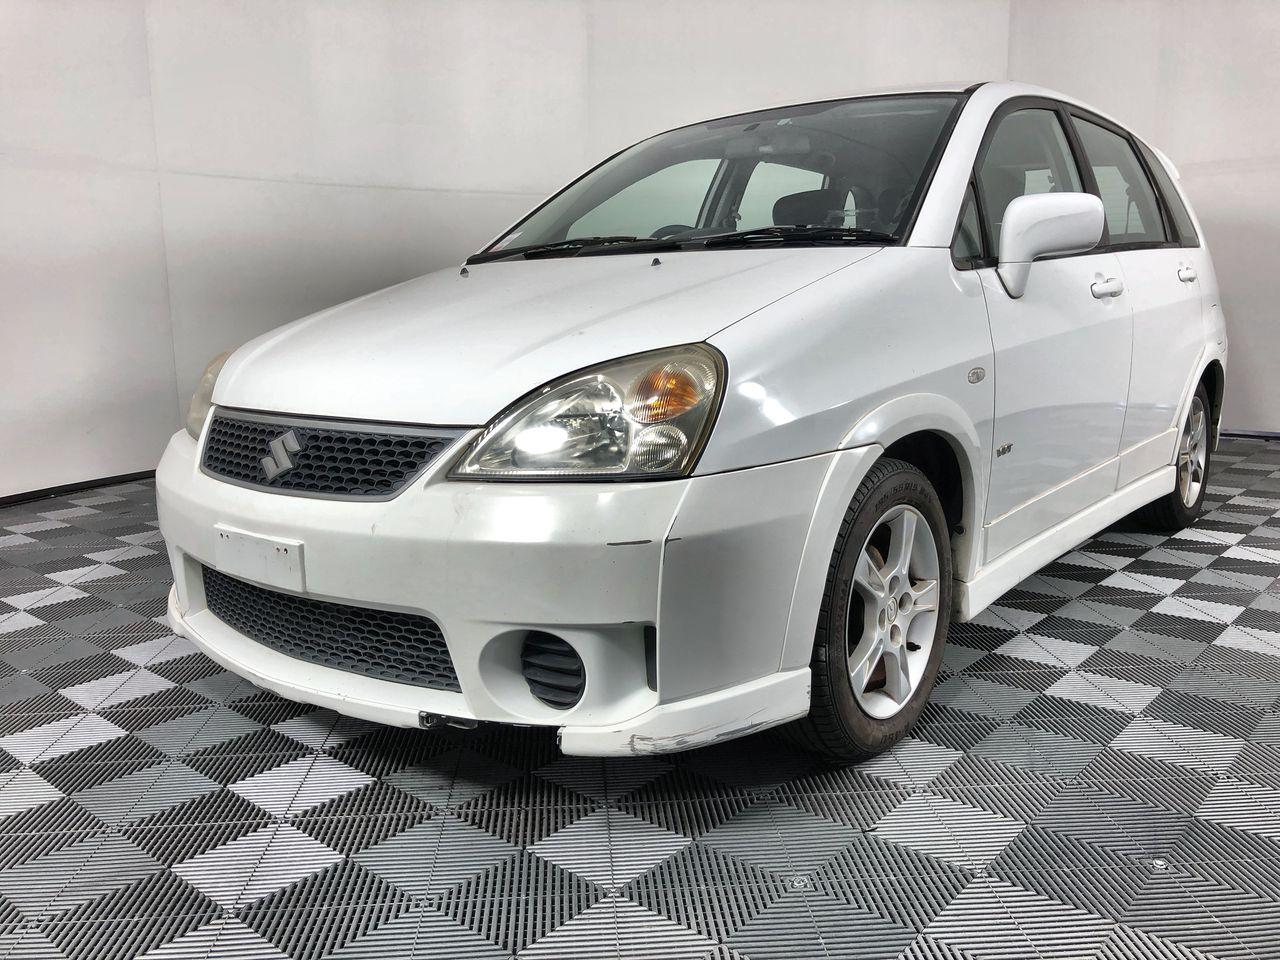 2005 Suzuki Liana 1.8L 4cyl Petrol Hatchback